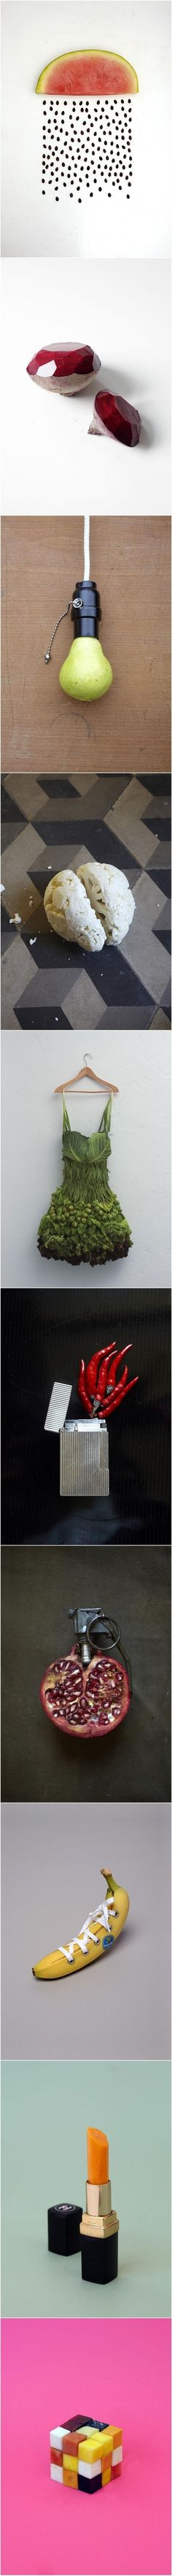 Arte comida criativa